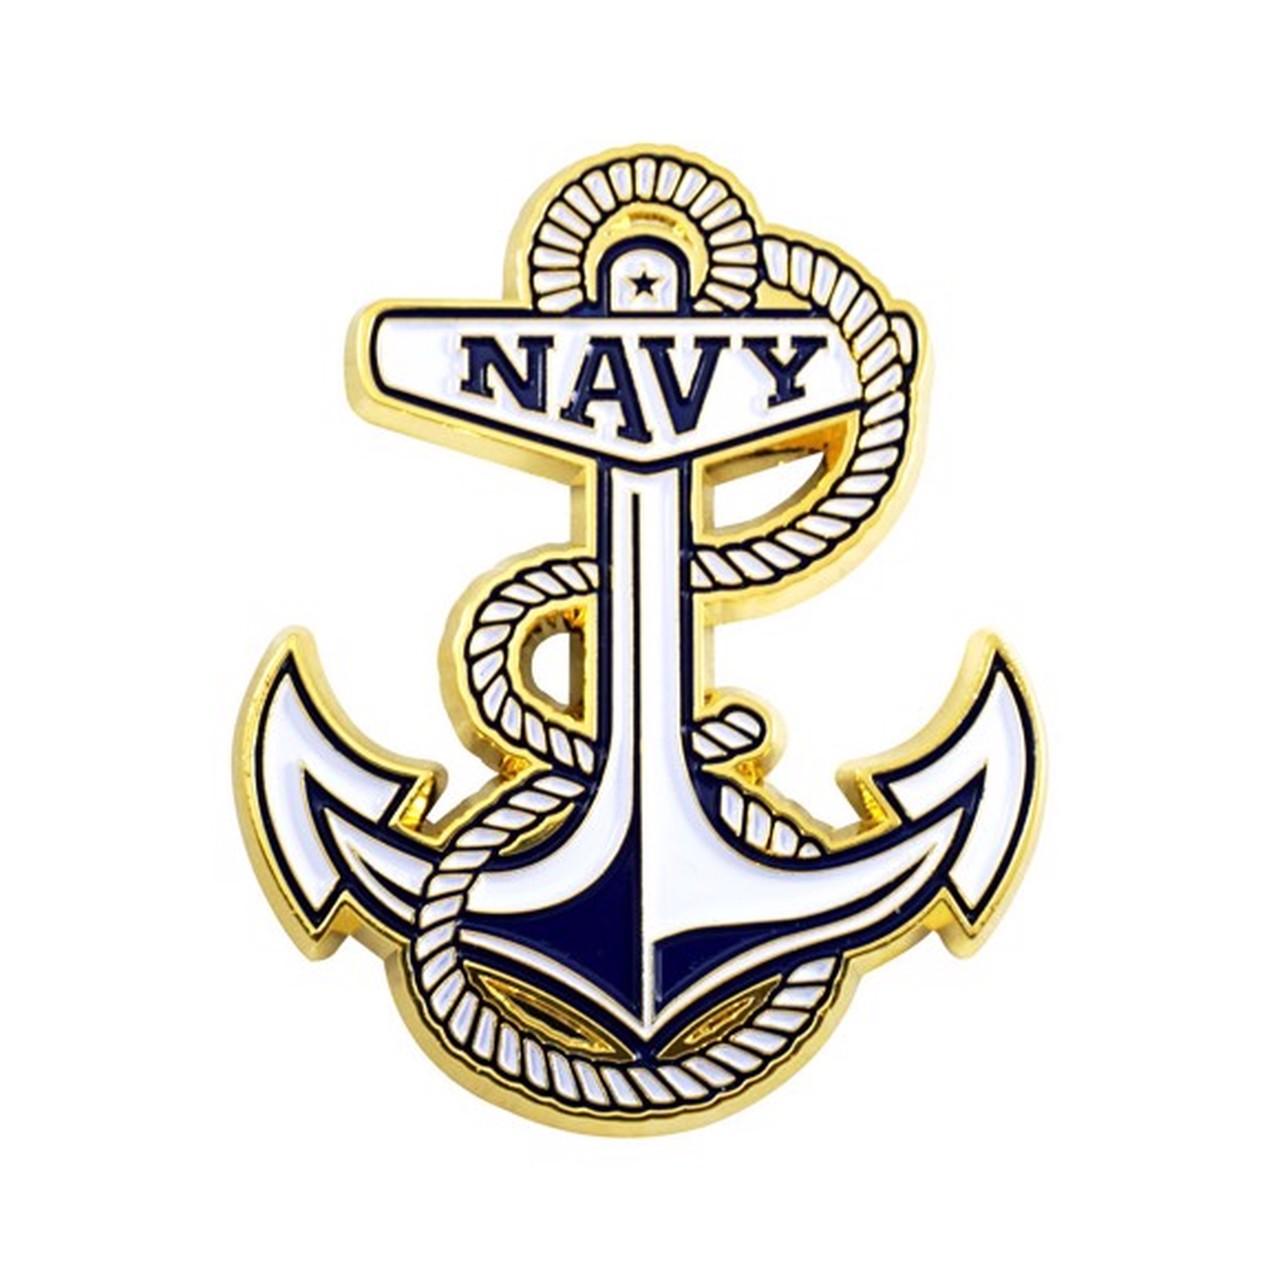 U.S. Naval Academy Color Metal Emblem.